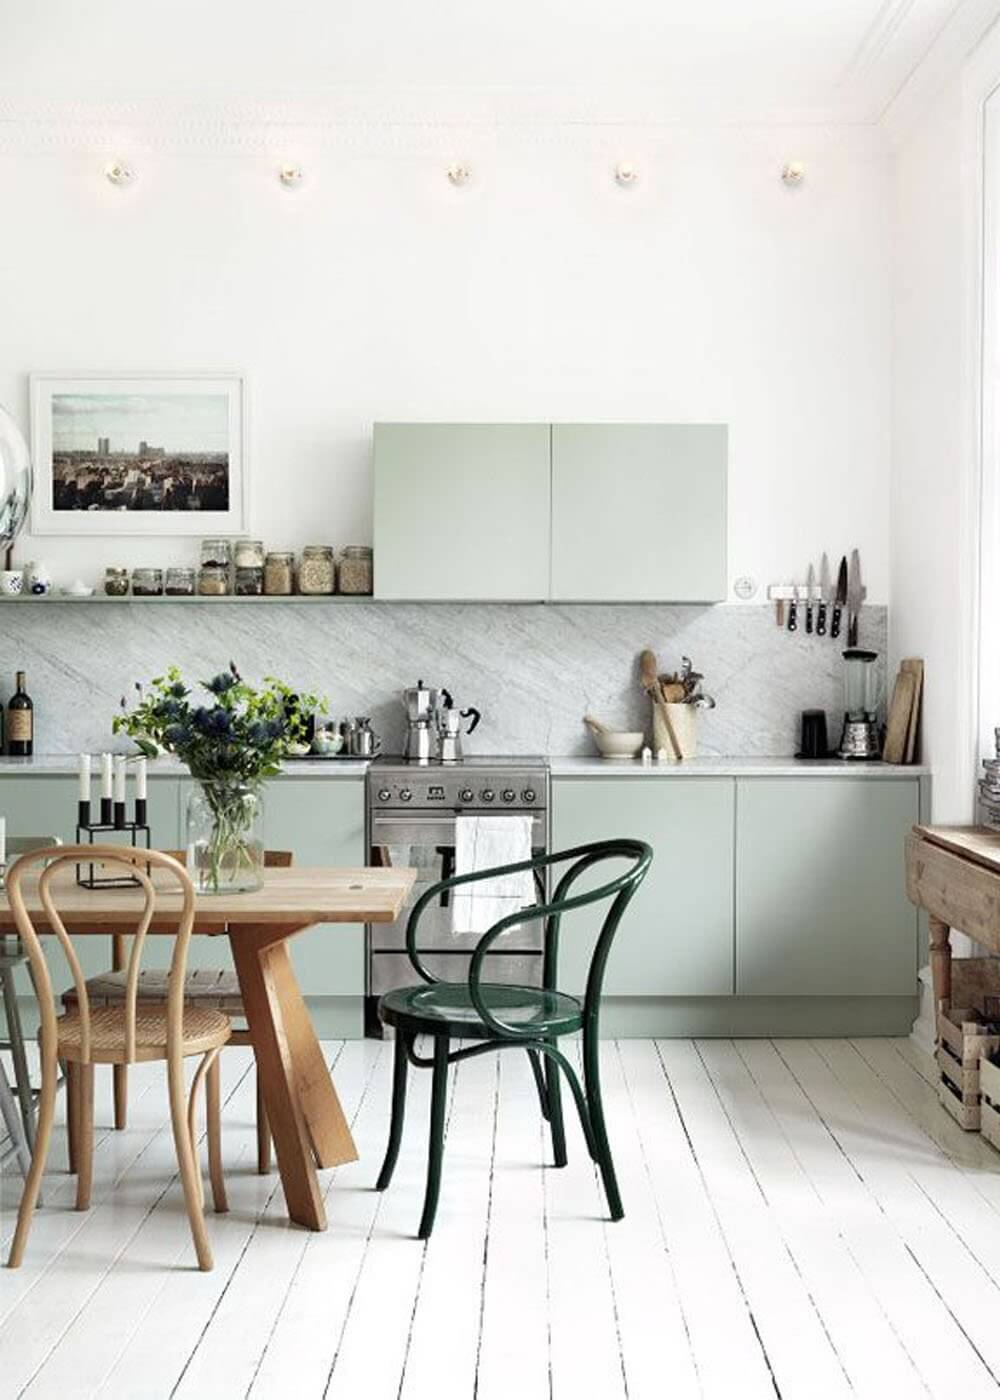 mint-green-kitchen-cabinets-scandinavian-interior-nordroom